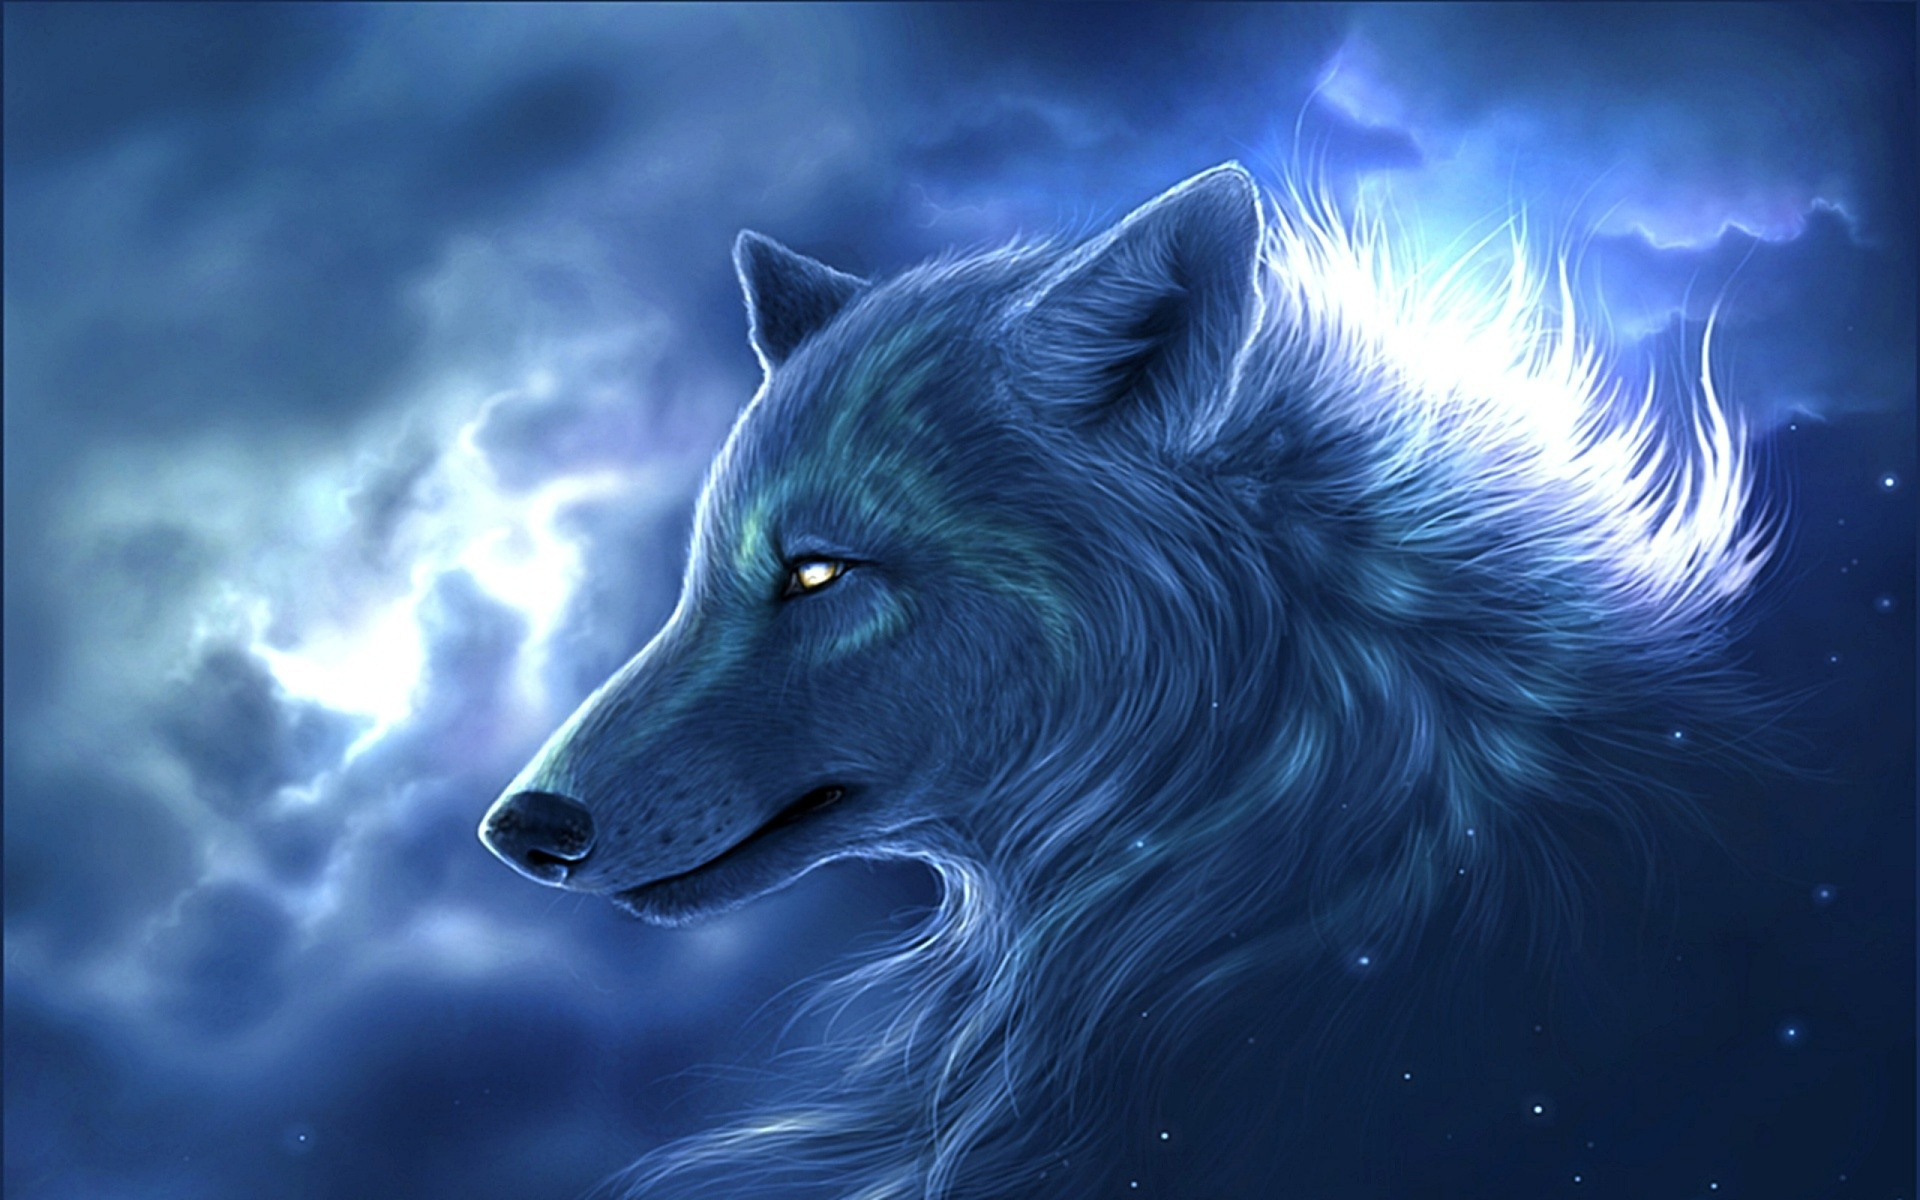 fantasy art wolf animal hd wallpaper HD Wallpapers 1920x1200